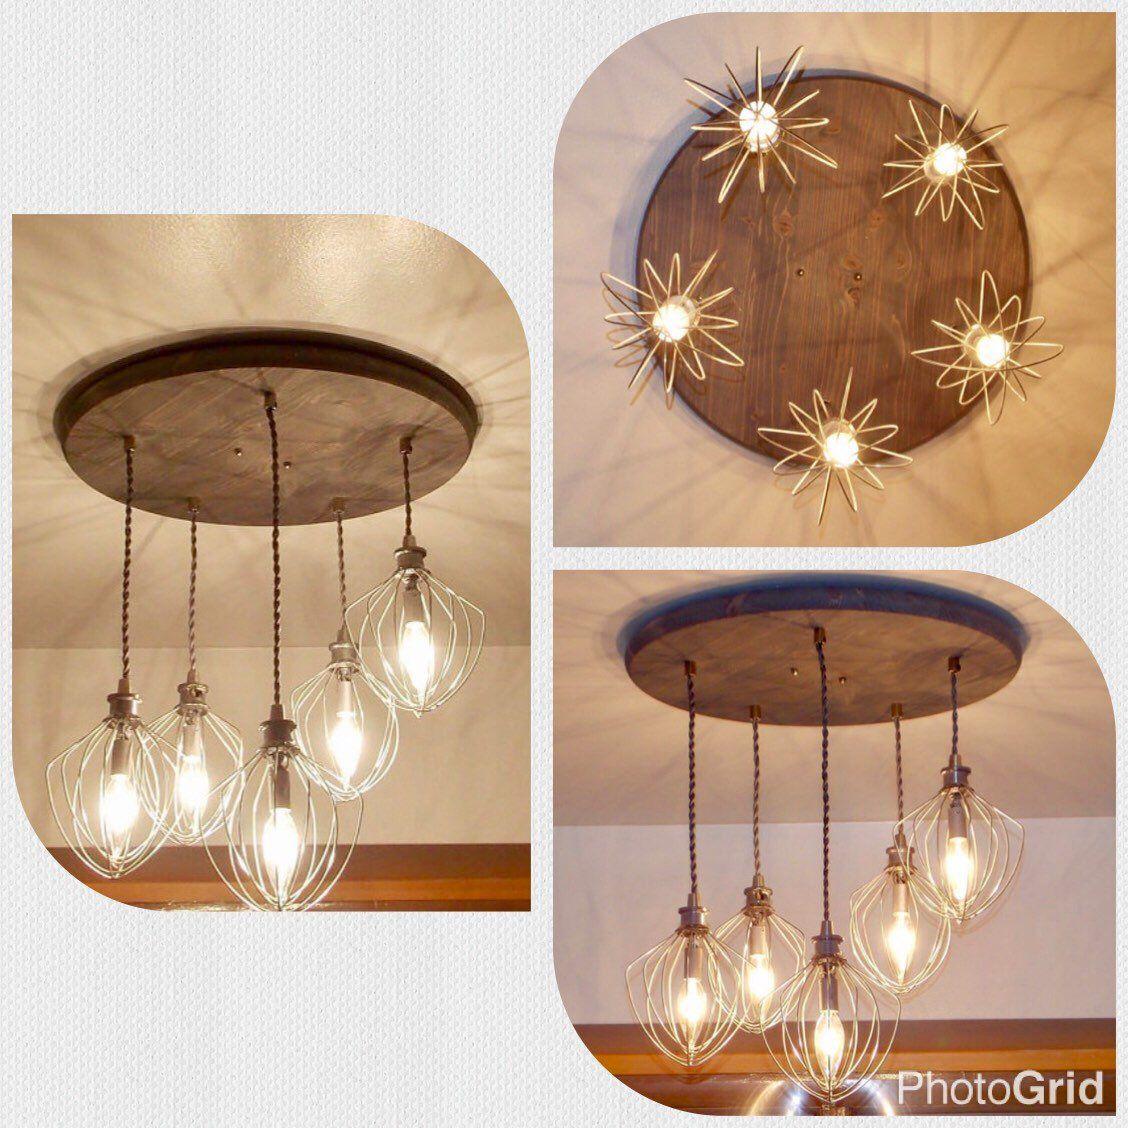 Dining chandelier rustic modern pendant lights wood rustic